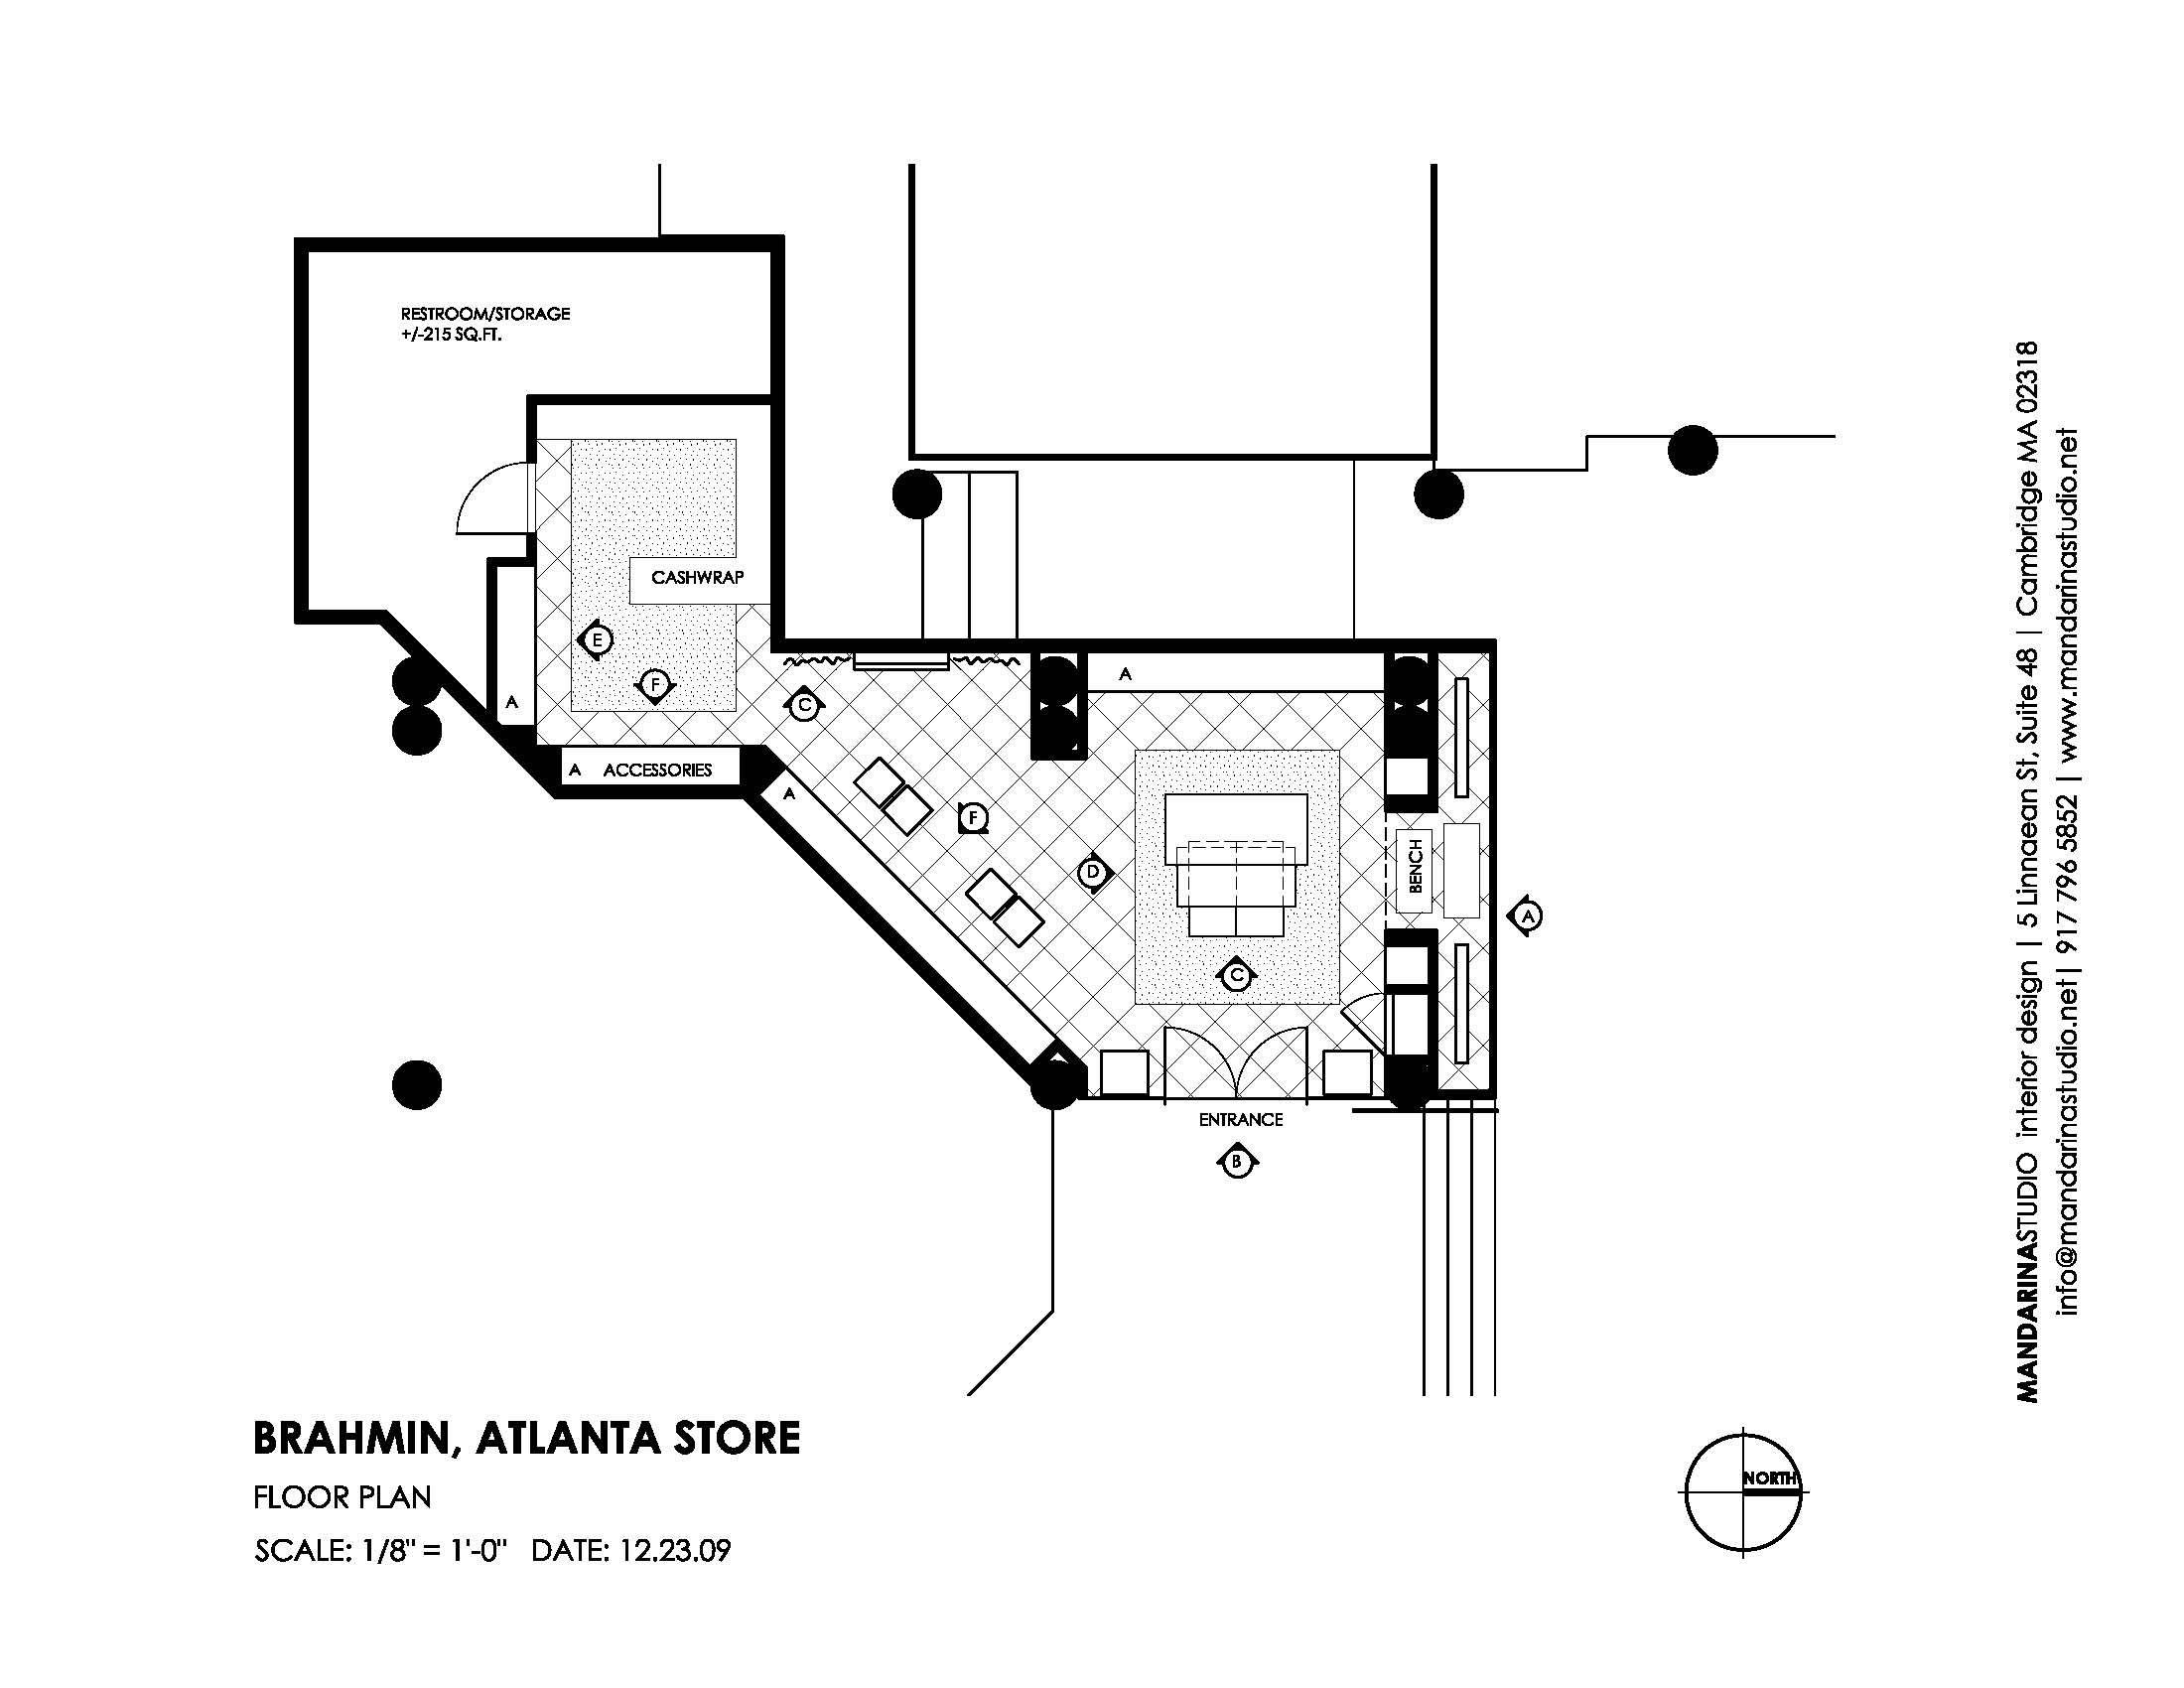 BRAHMIN Atlanta Floor Plan